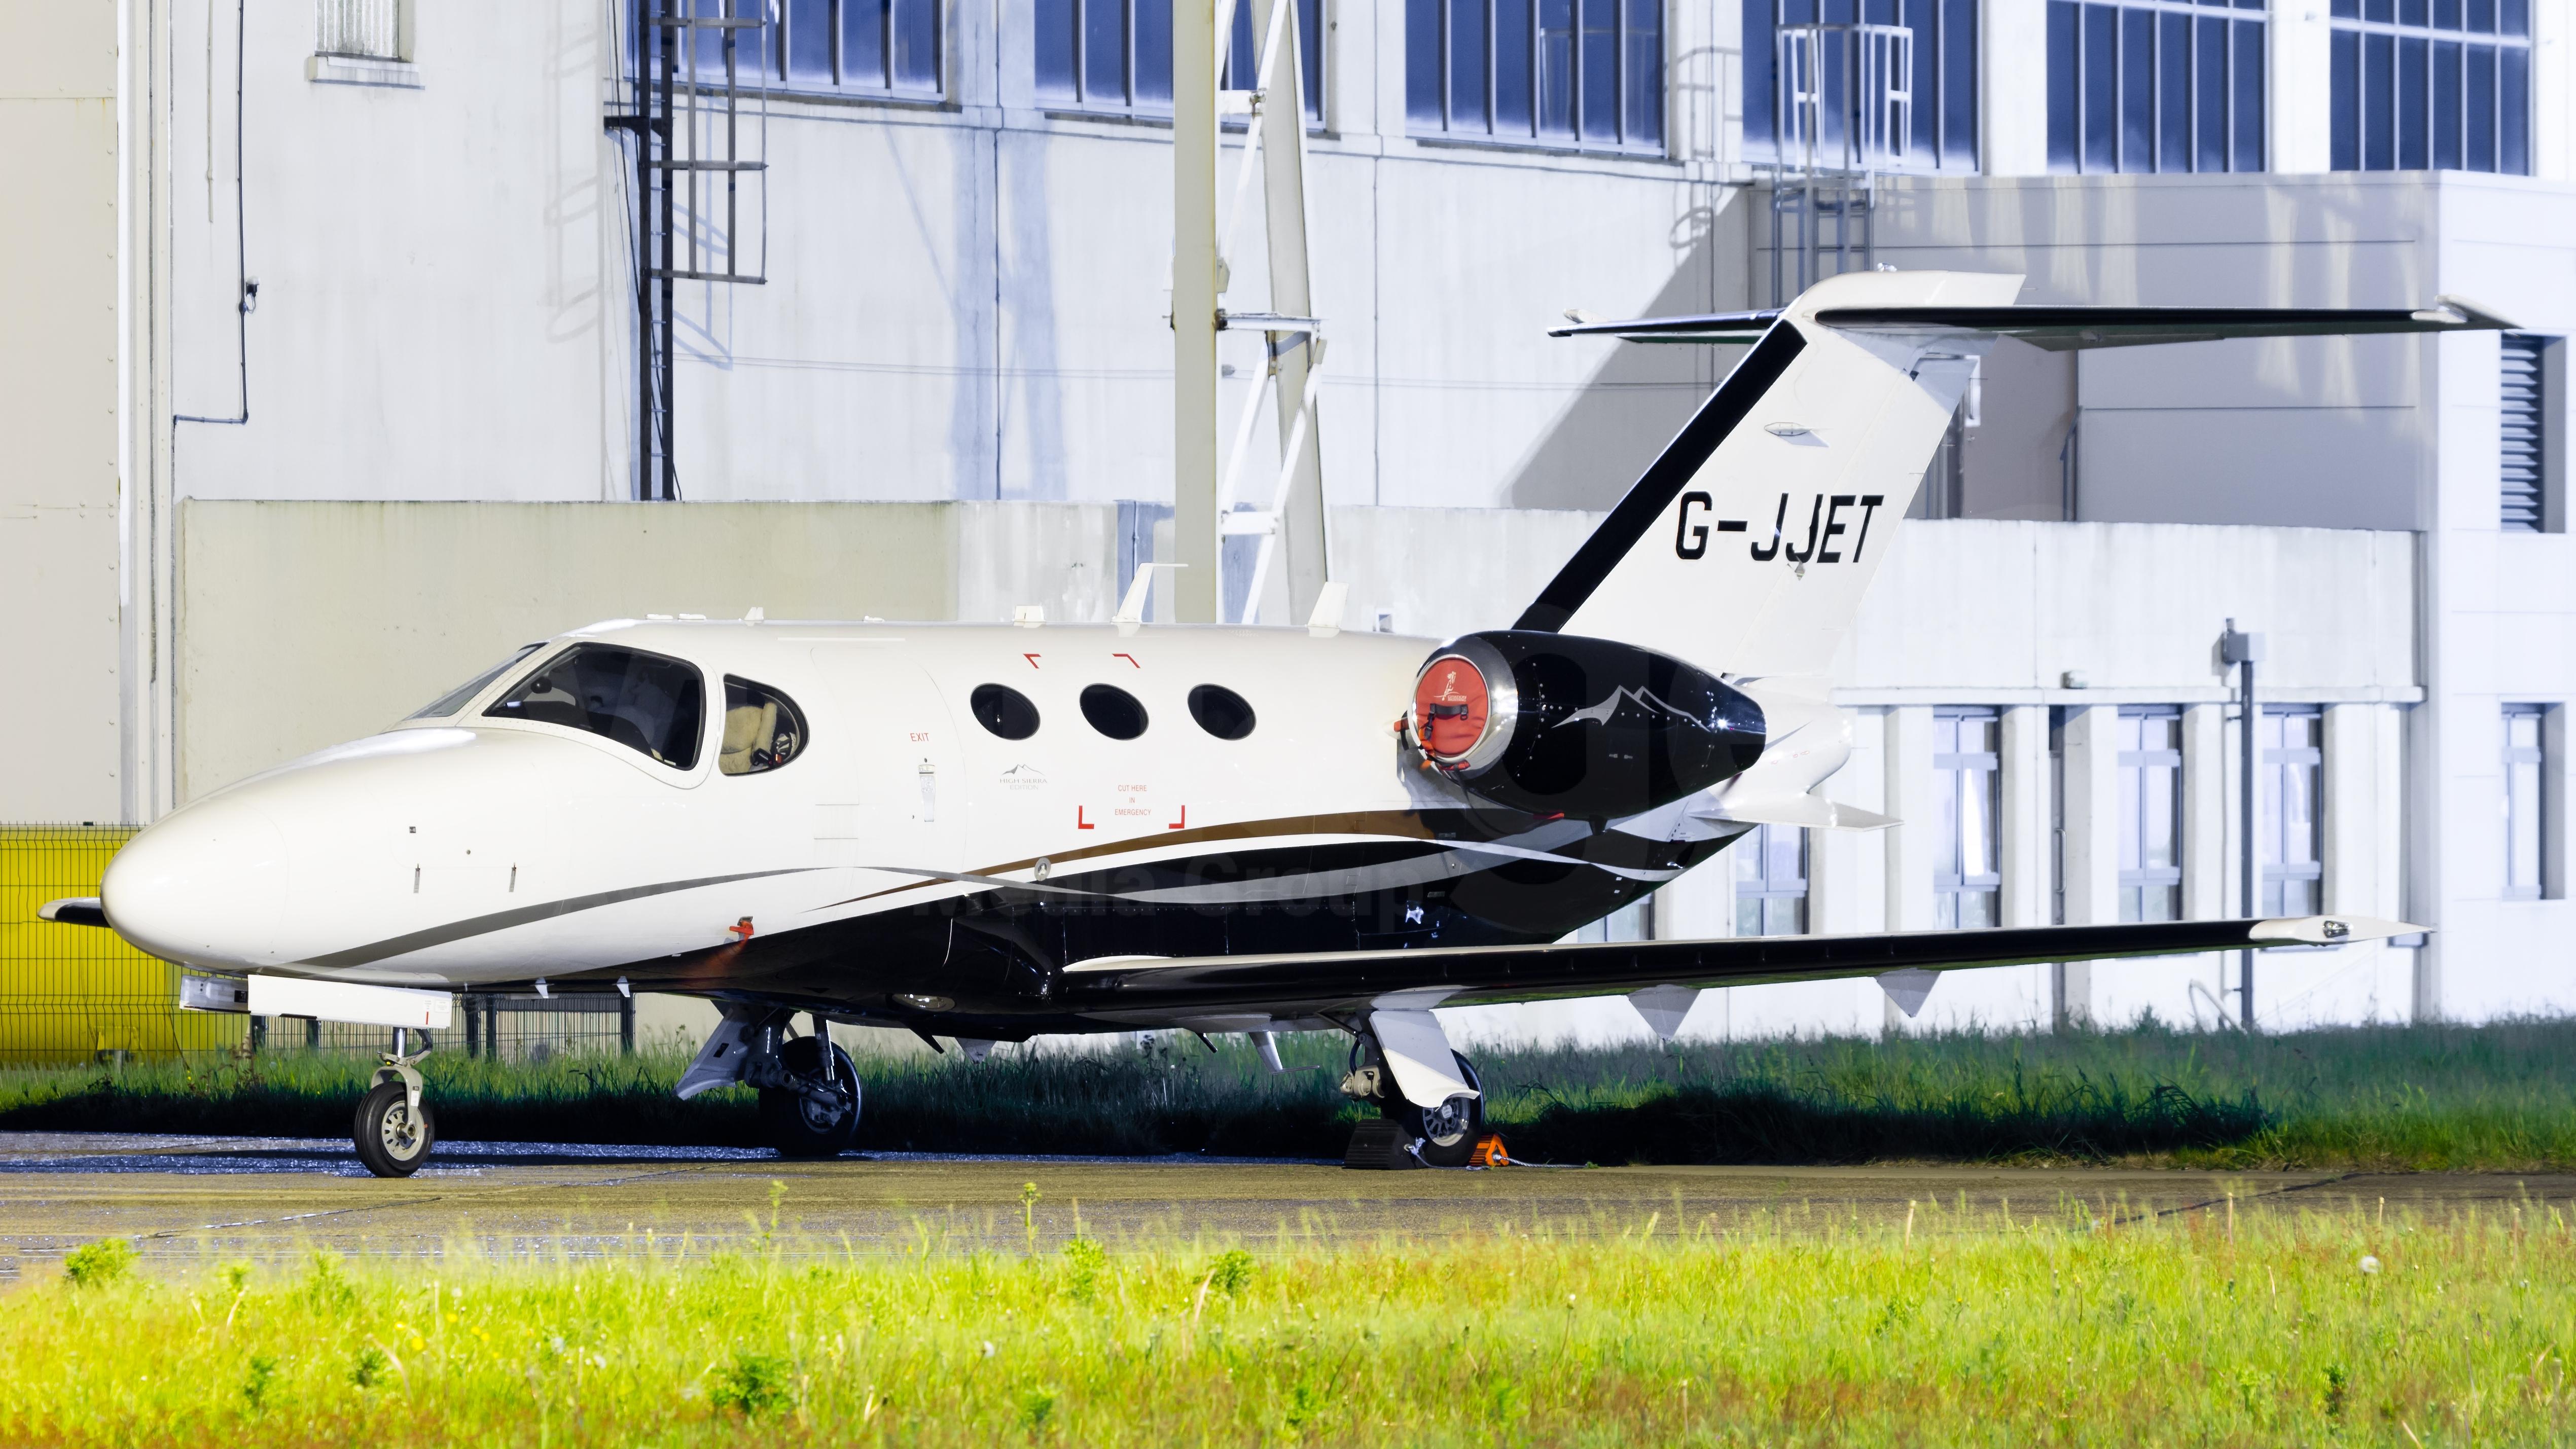 Private Cessna 510 Citation Mustang G-JJET